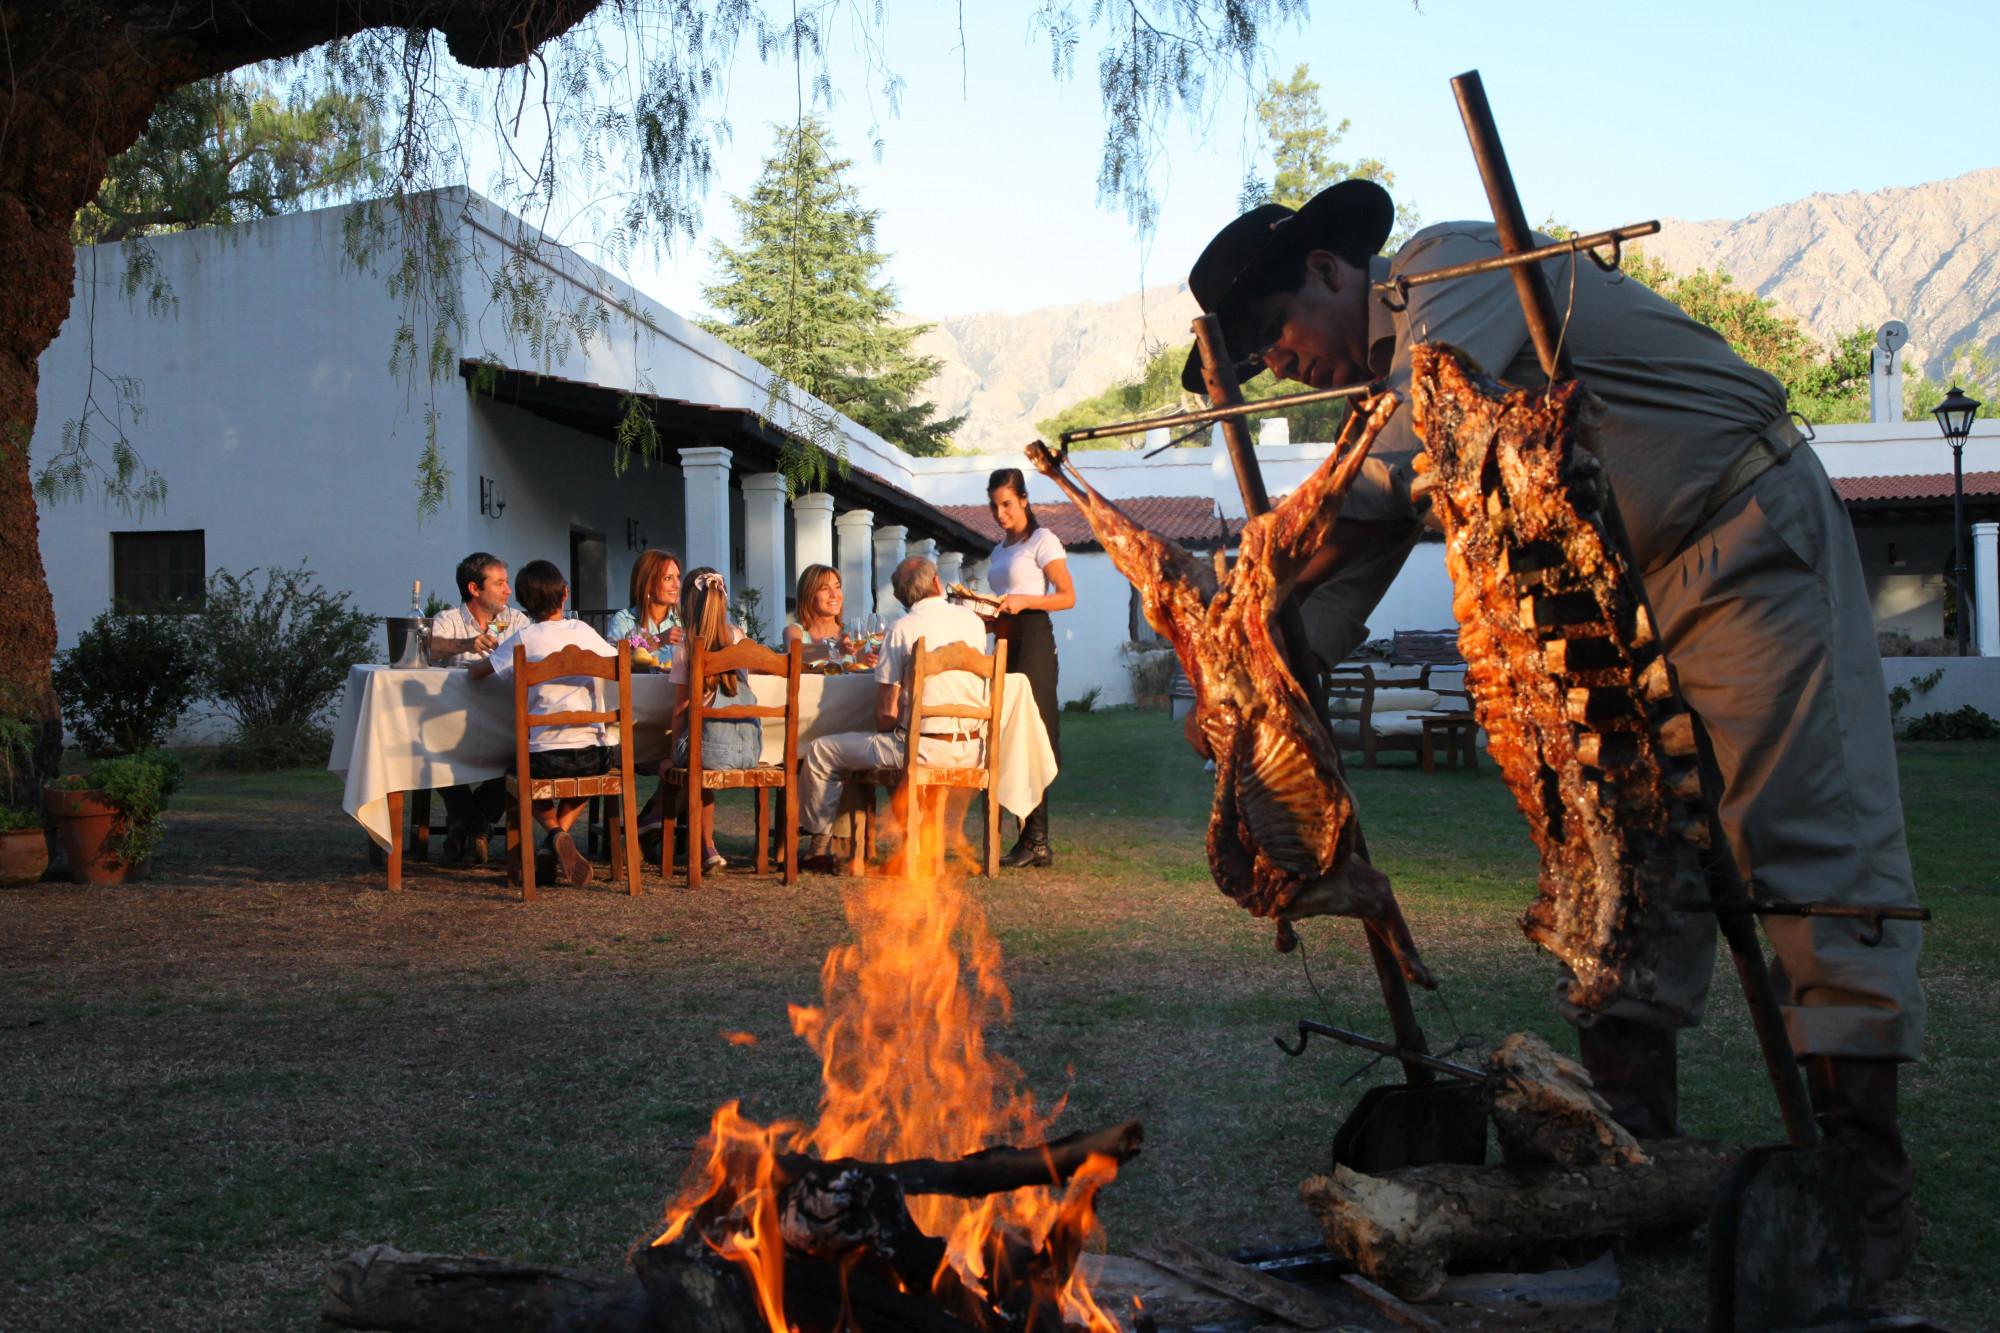 Se viene la 10 Fiesta Regional de comidas Artesanales de Alpa Corral